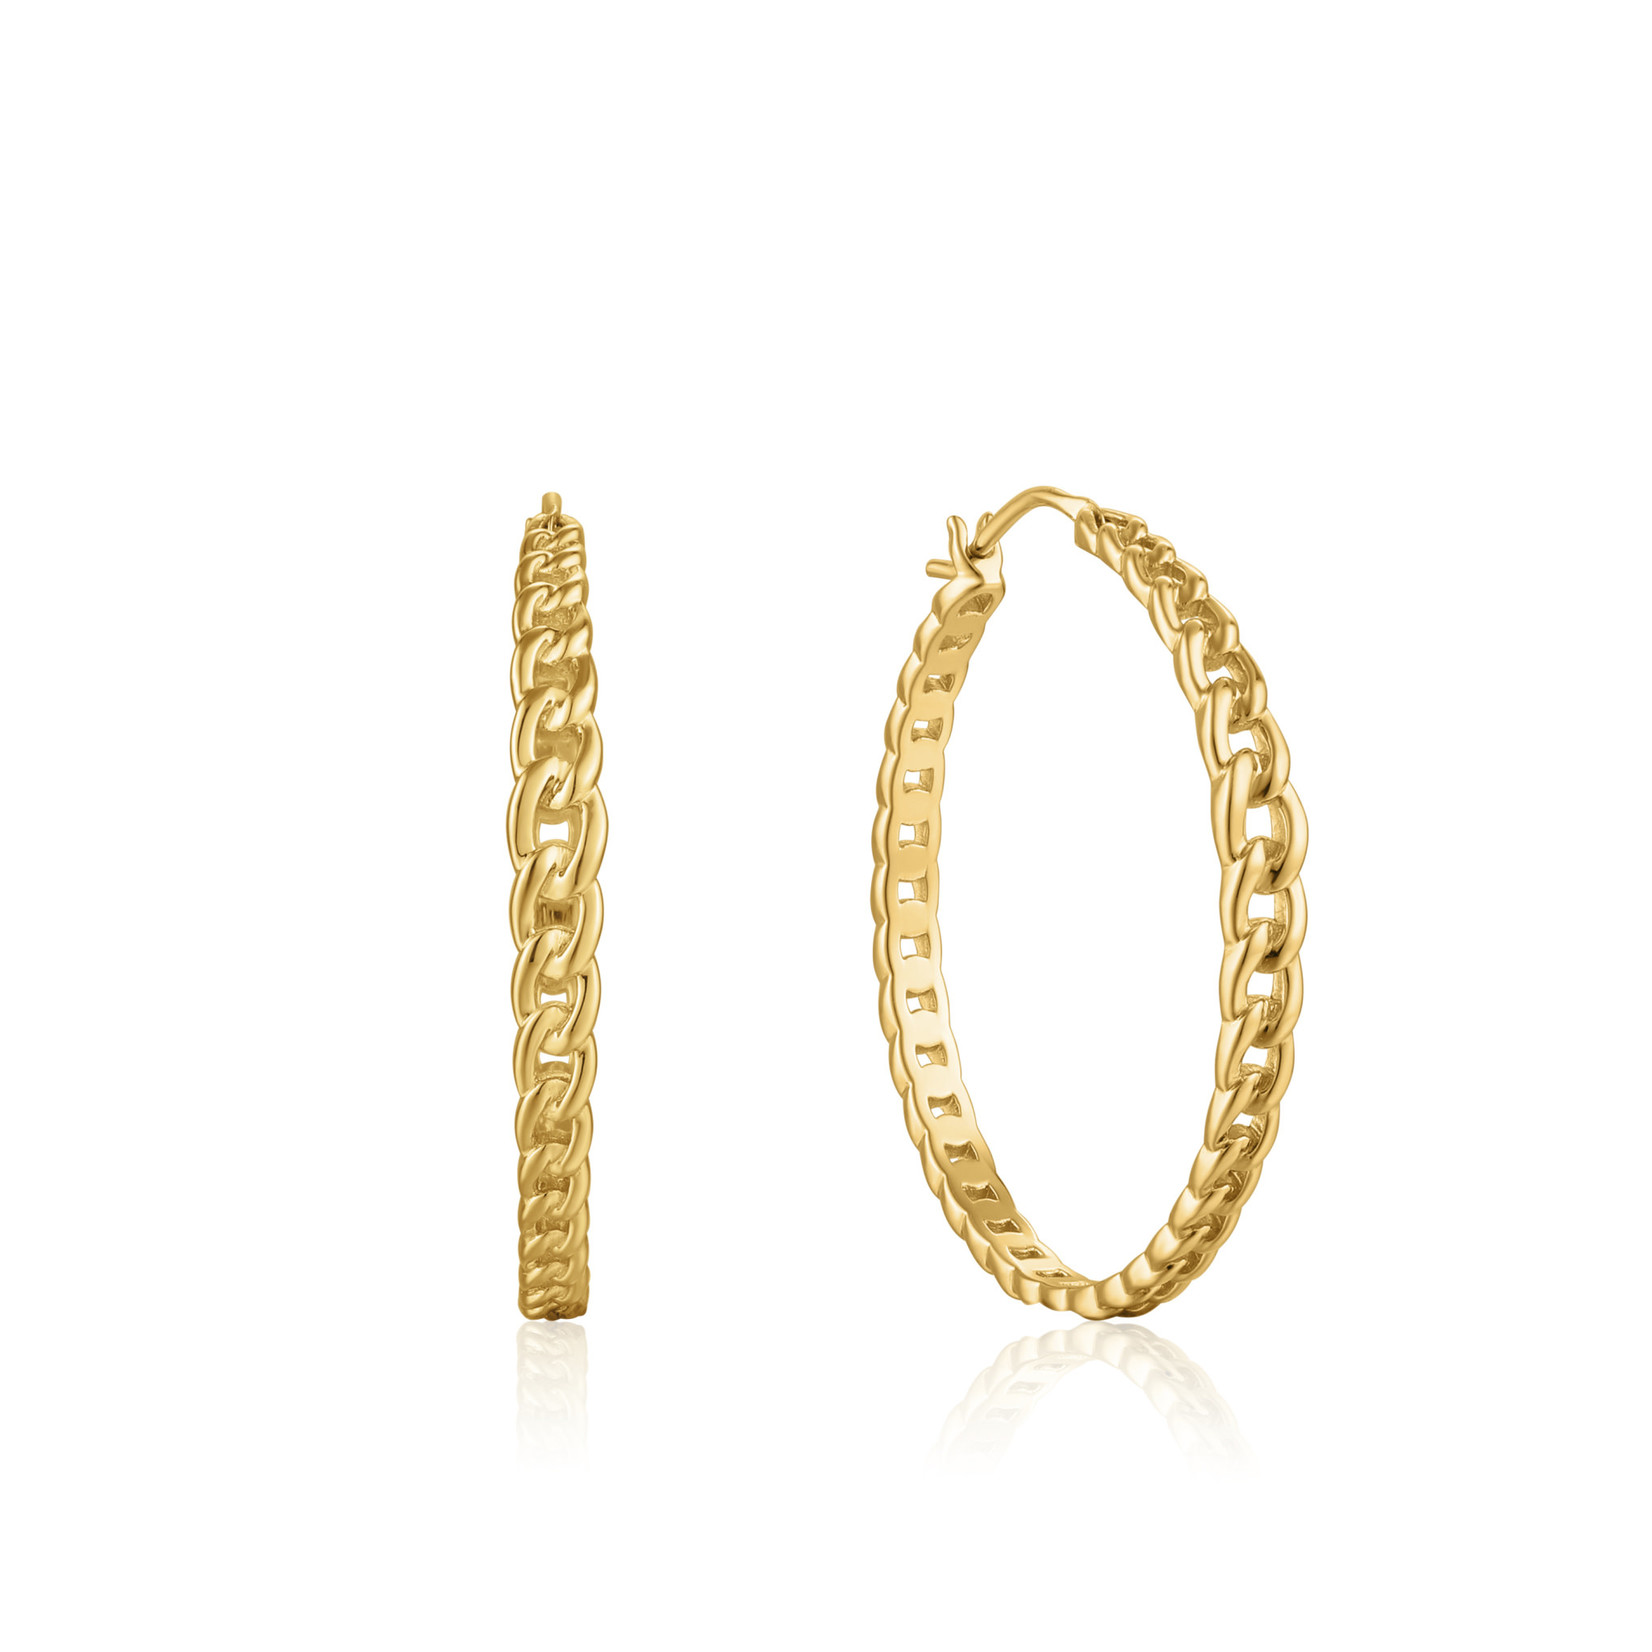 Ania Haie Curb Chain Hoop Earrings